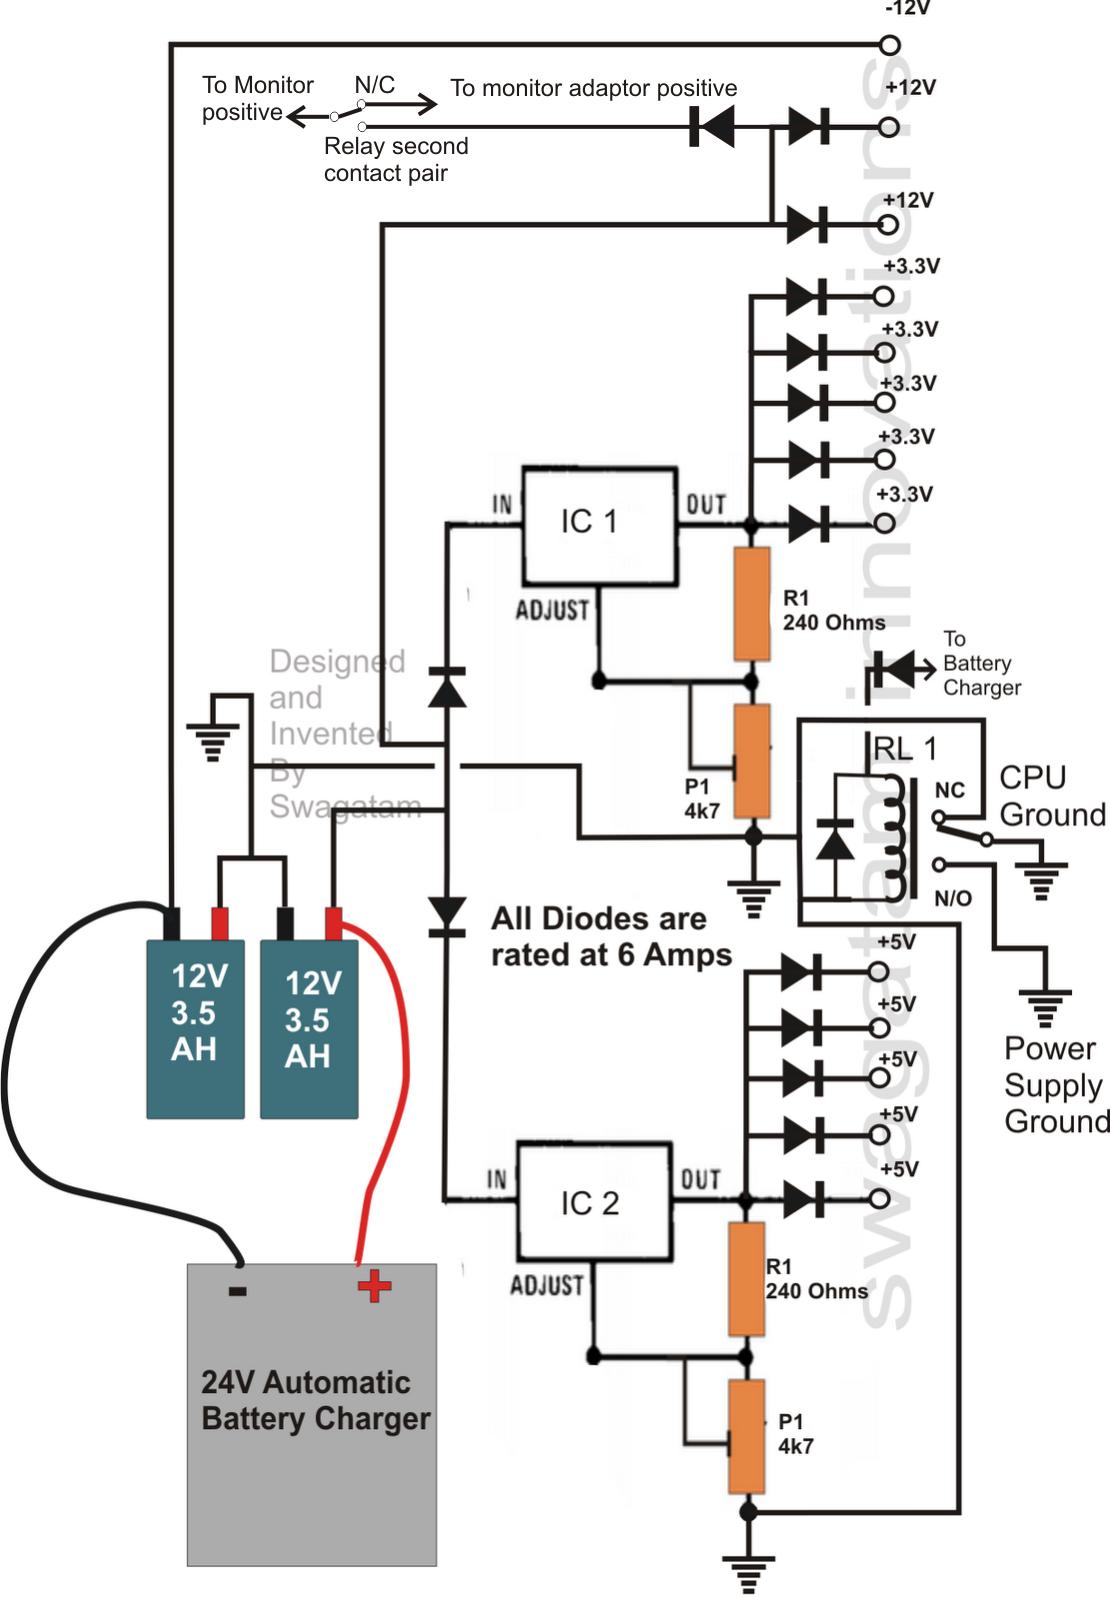 ups wiring diagram 1993 ford ranger fuel pump transformerless circuit for computers cpu